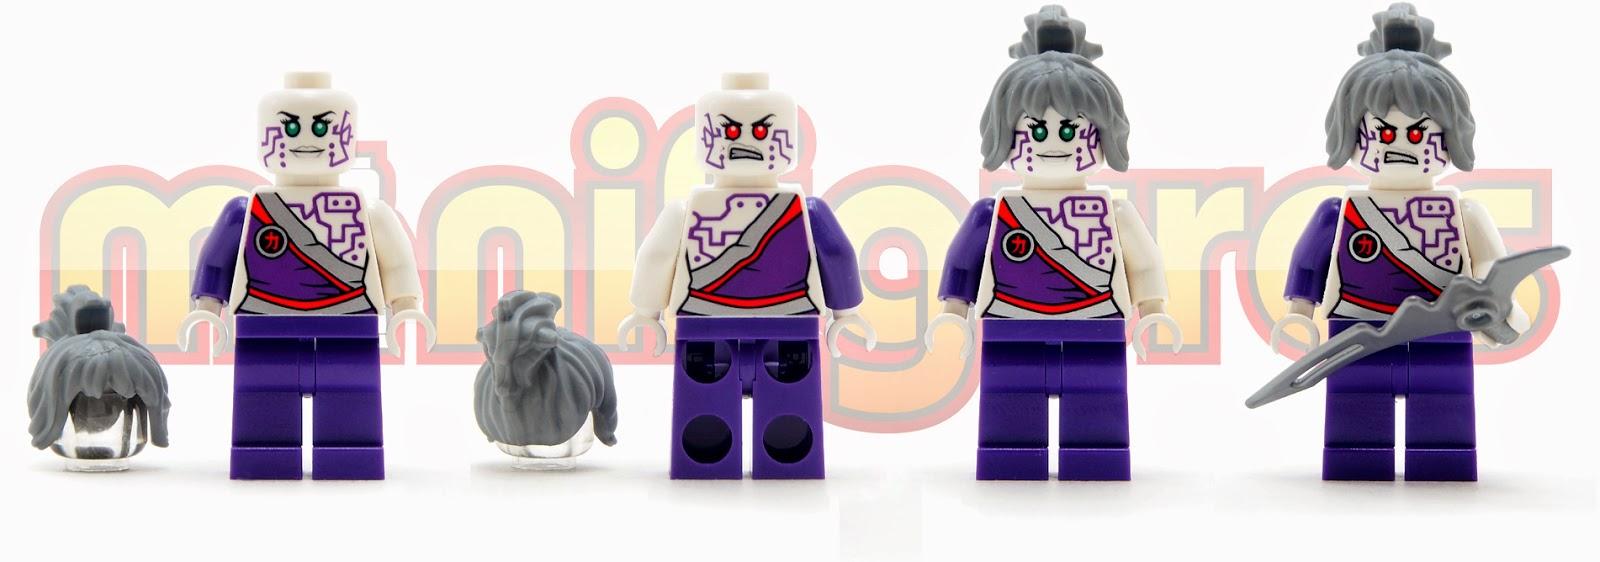 Oz Brick Nation Lego Ninjago Pixal Minifigure Review